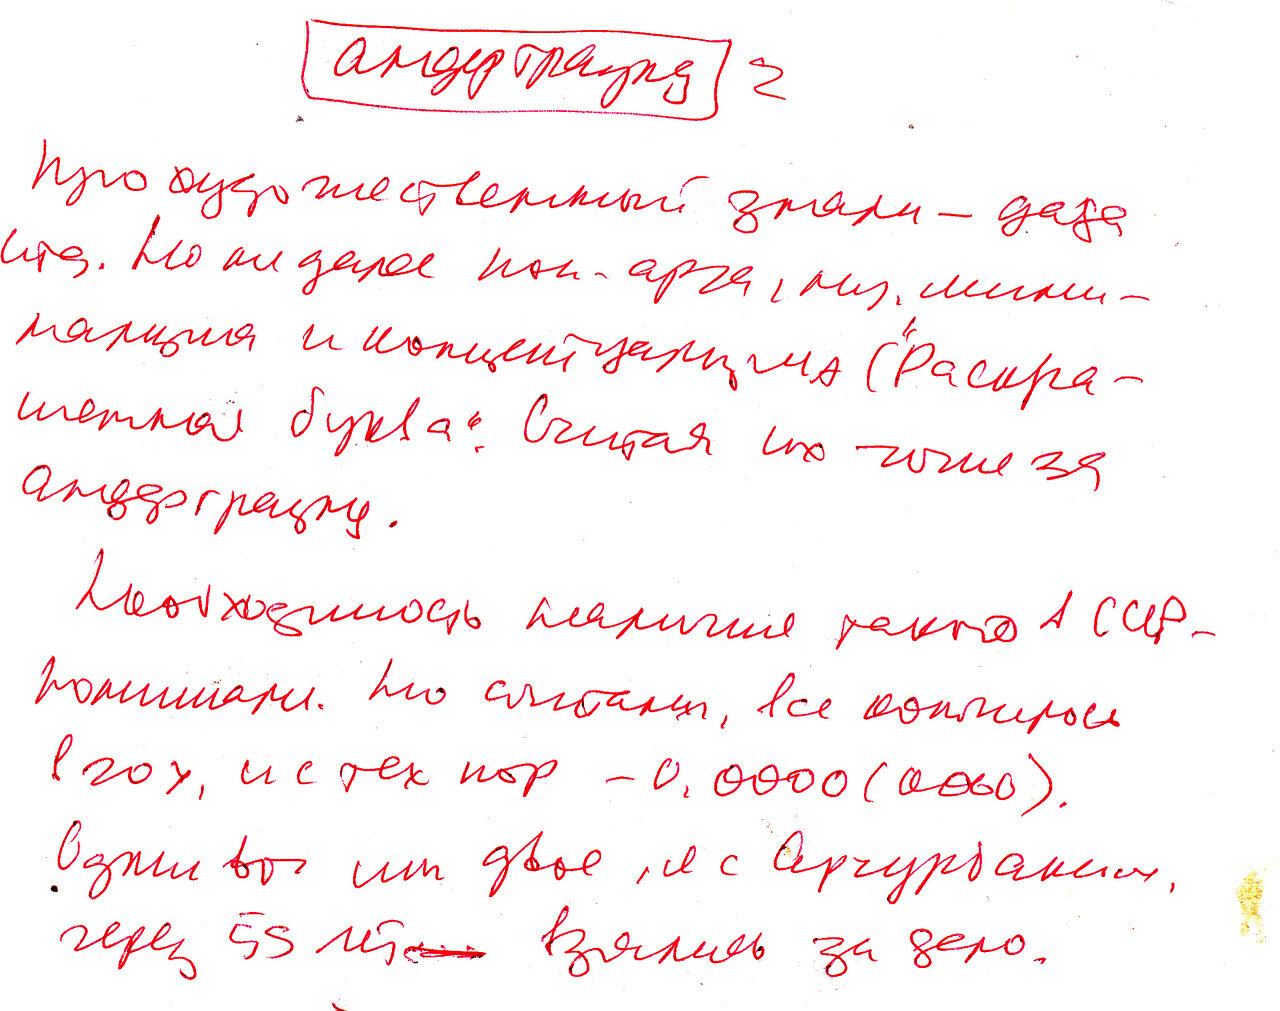 0_85ce7_da44849e_XXXL.jpg